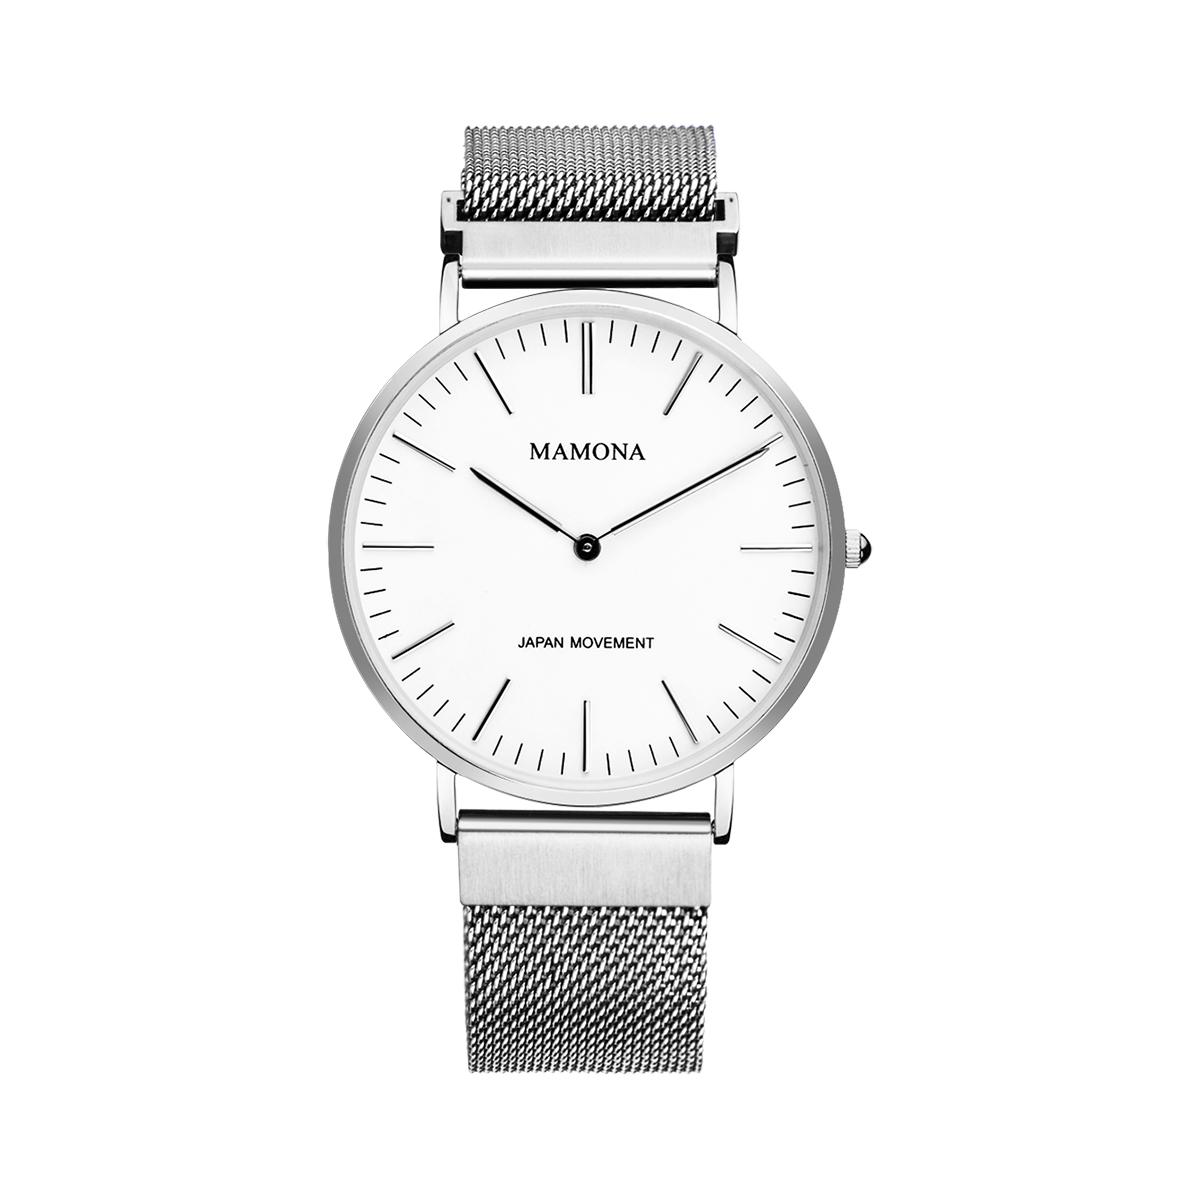 8495c57edb13 MAMONA Men s Watches Milanese Loop Bracelete G3881WT. €169.99 €59.99. Ultra  Thin Bracelet ...